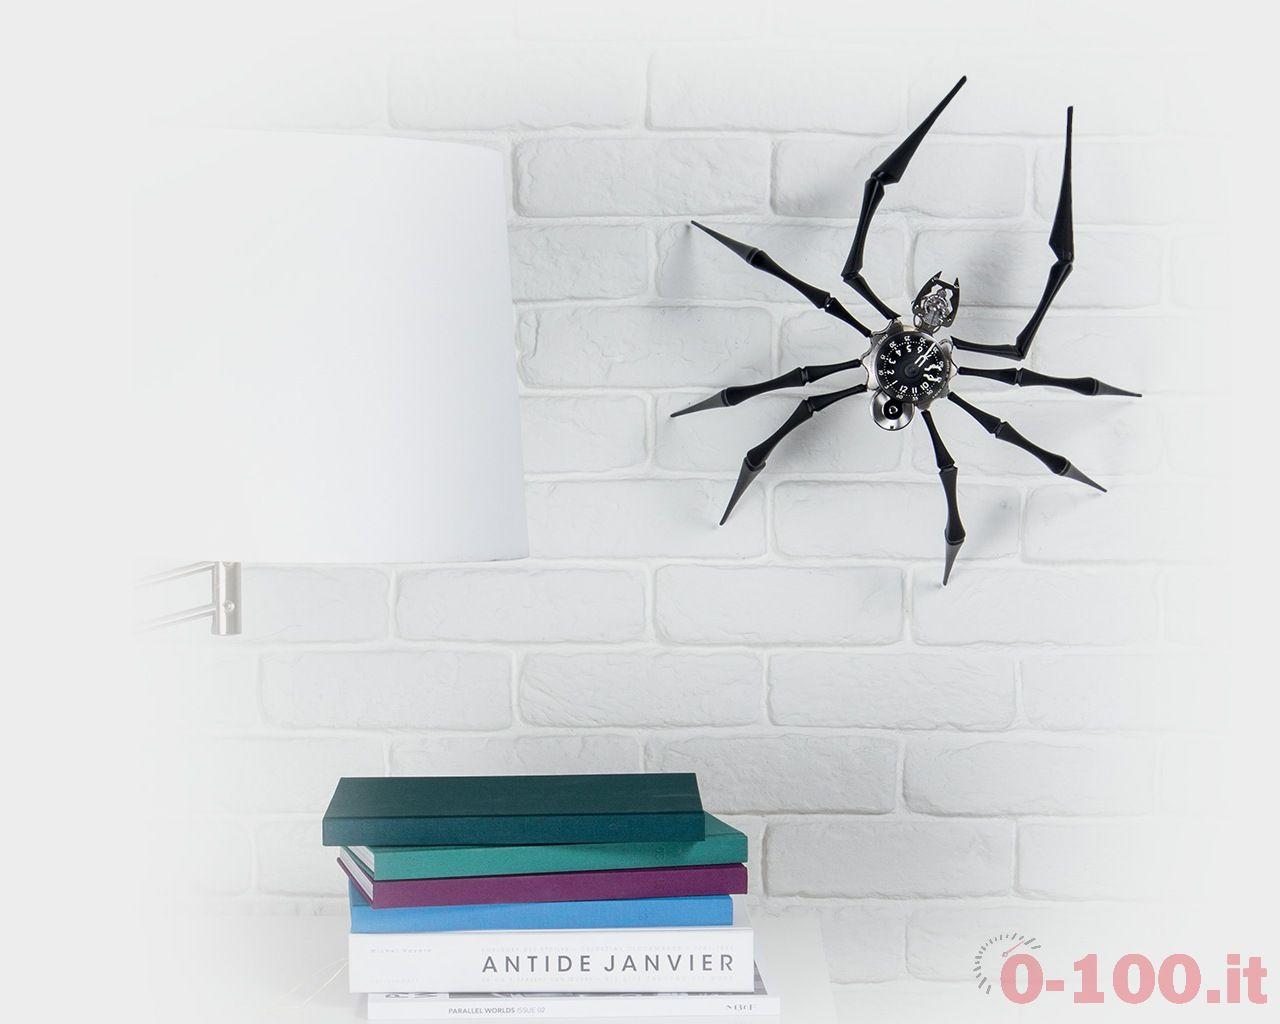 mbf-arachnophobia-lepee-1839_0-1003